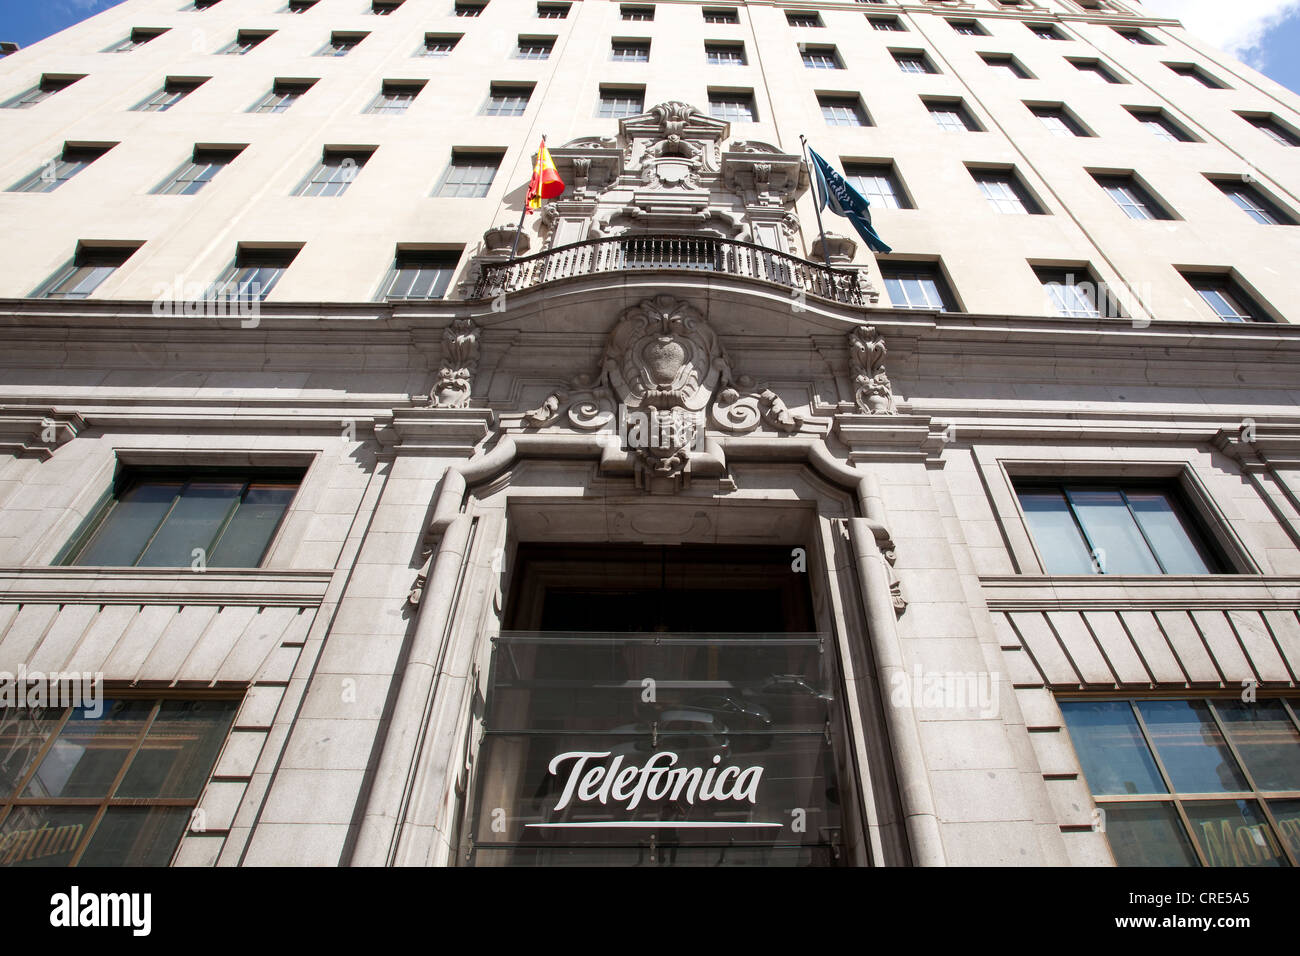 Headquarters of the Spanish telecommunications company Telefonica, Madrid, Spain, Europe - Stock Image